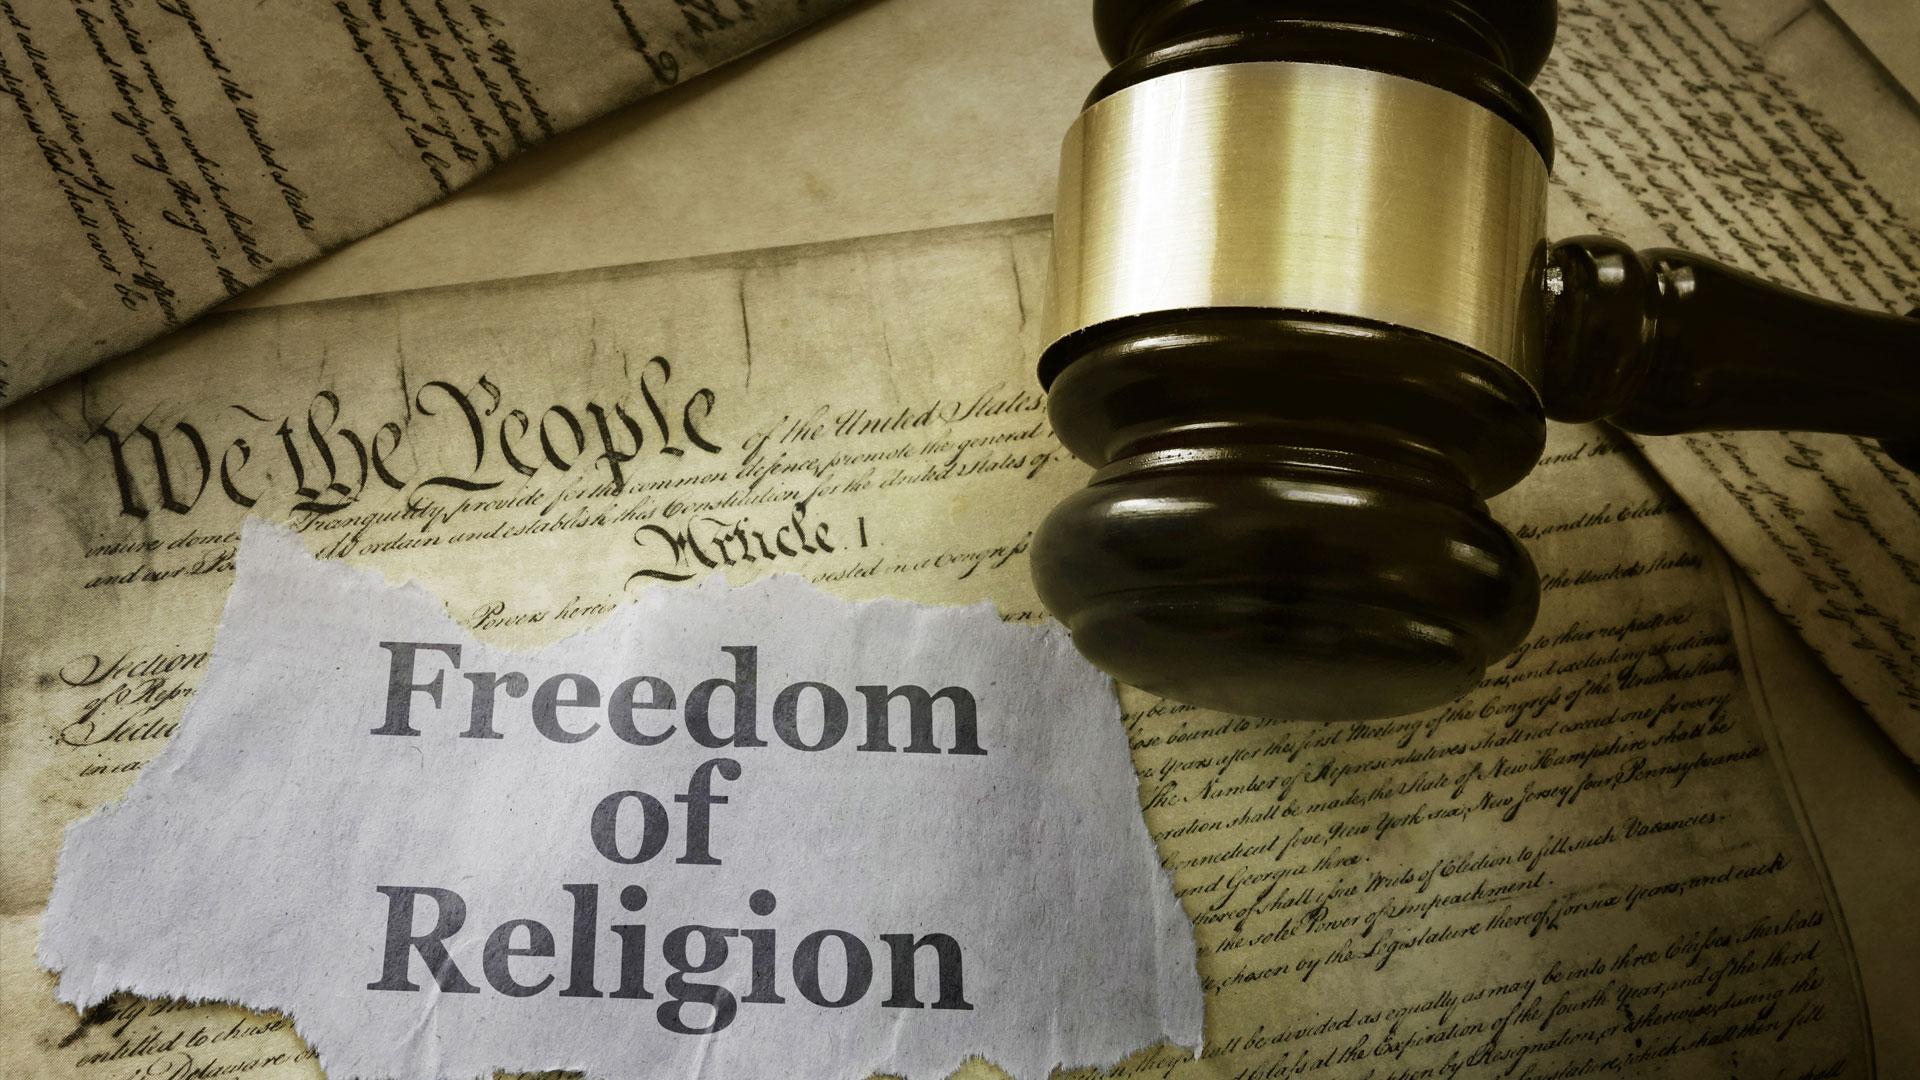 Freedom of Religion 2.jpg